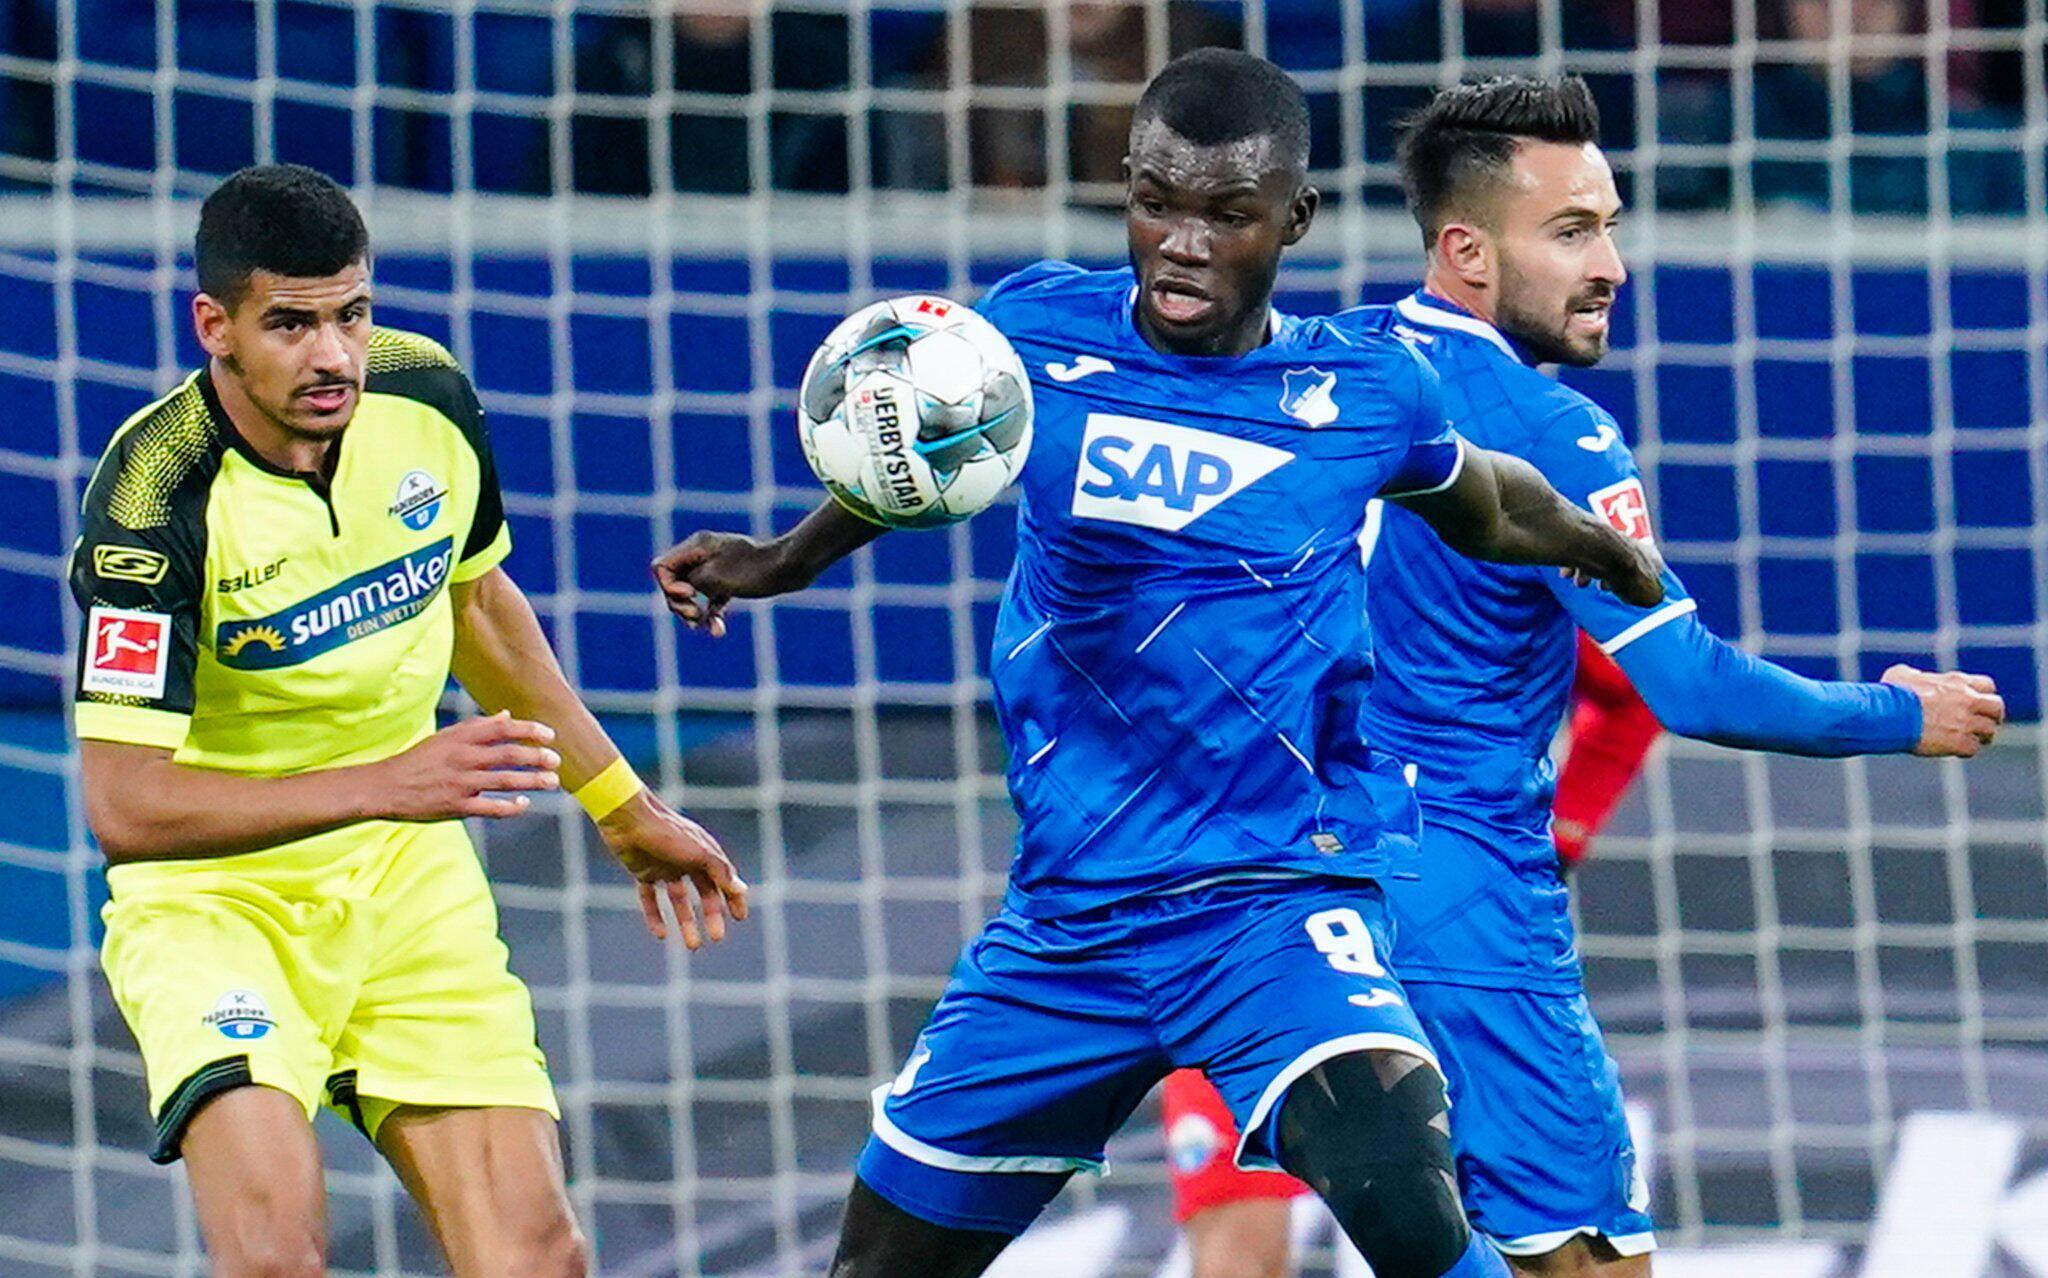 Paderborn-Hofenhaym Prognoza ot Bundesliga Betinum.com